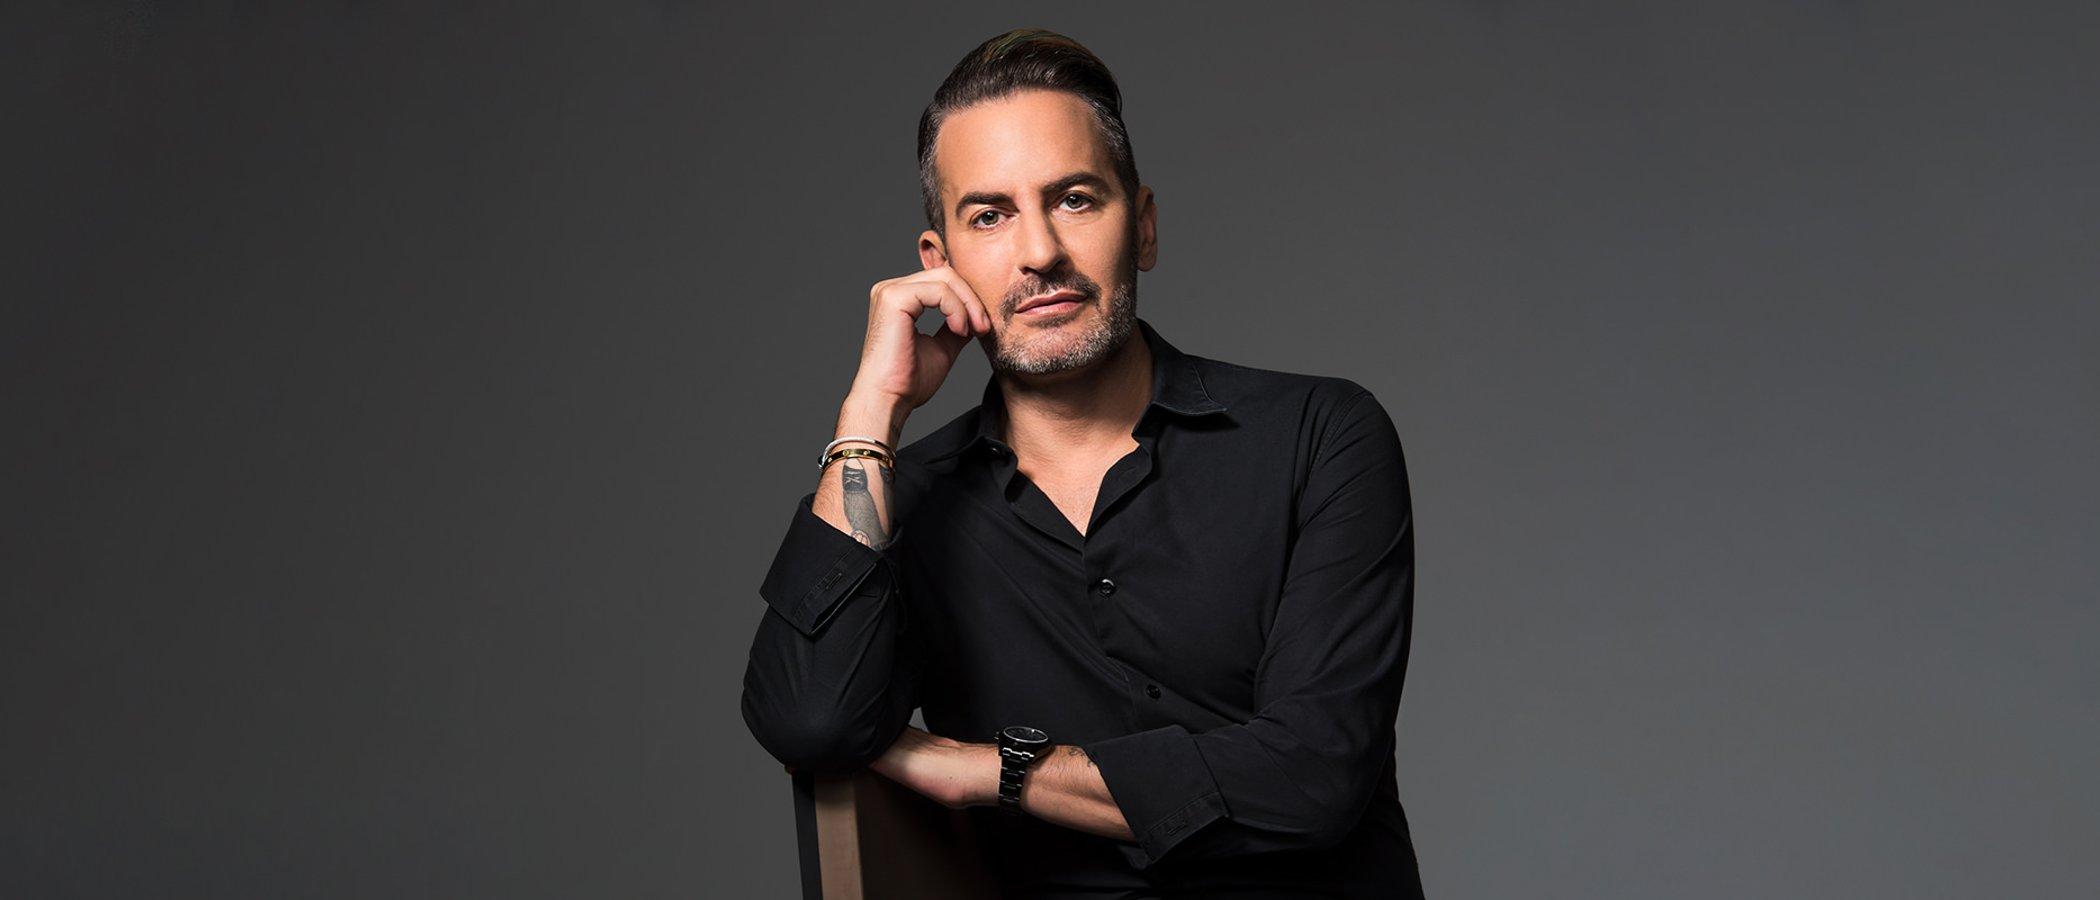 Marc Jacobs Teaches Fashion Design Masterclass